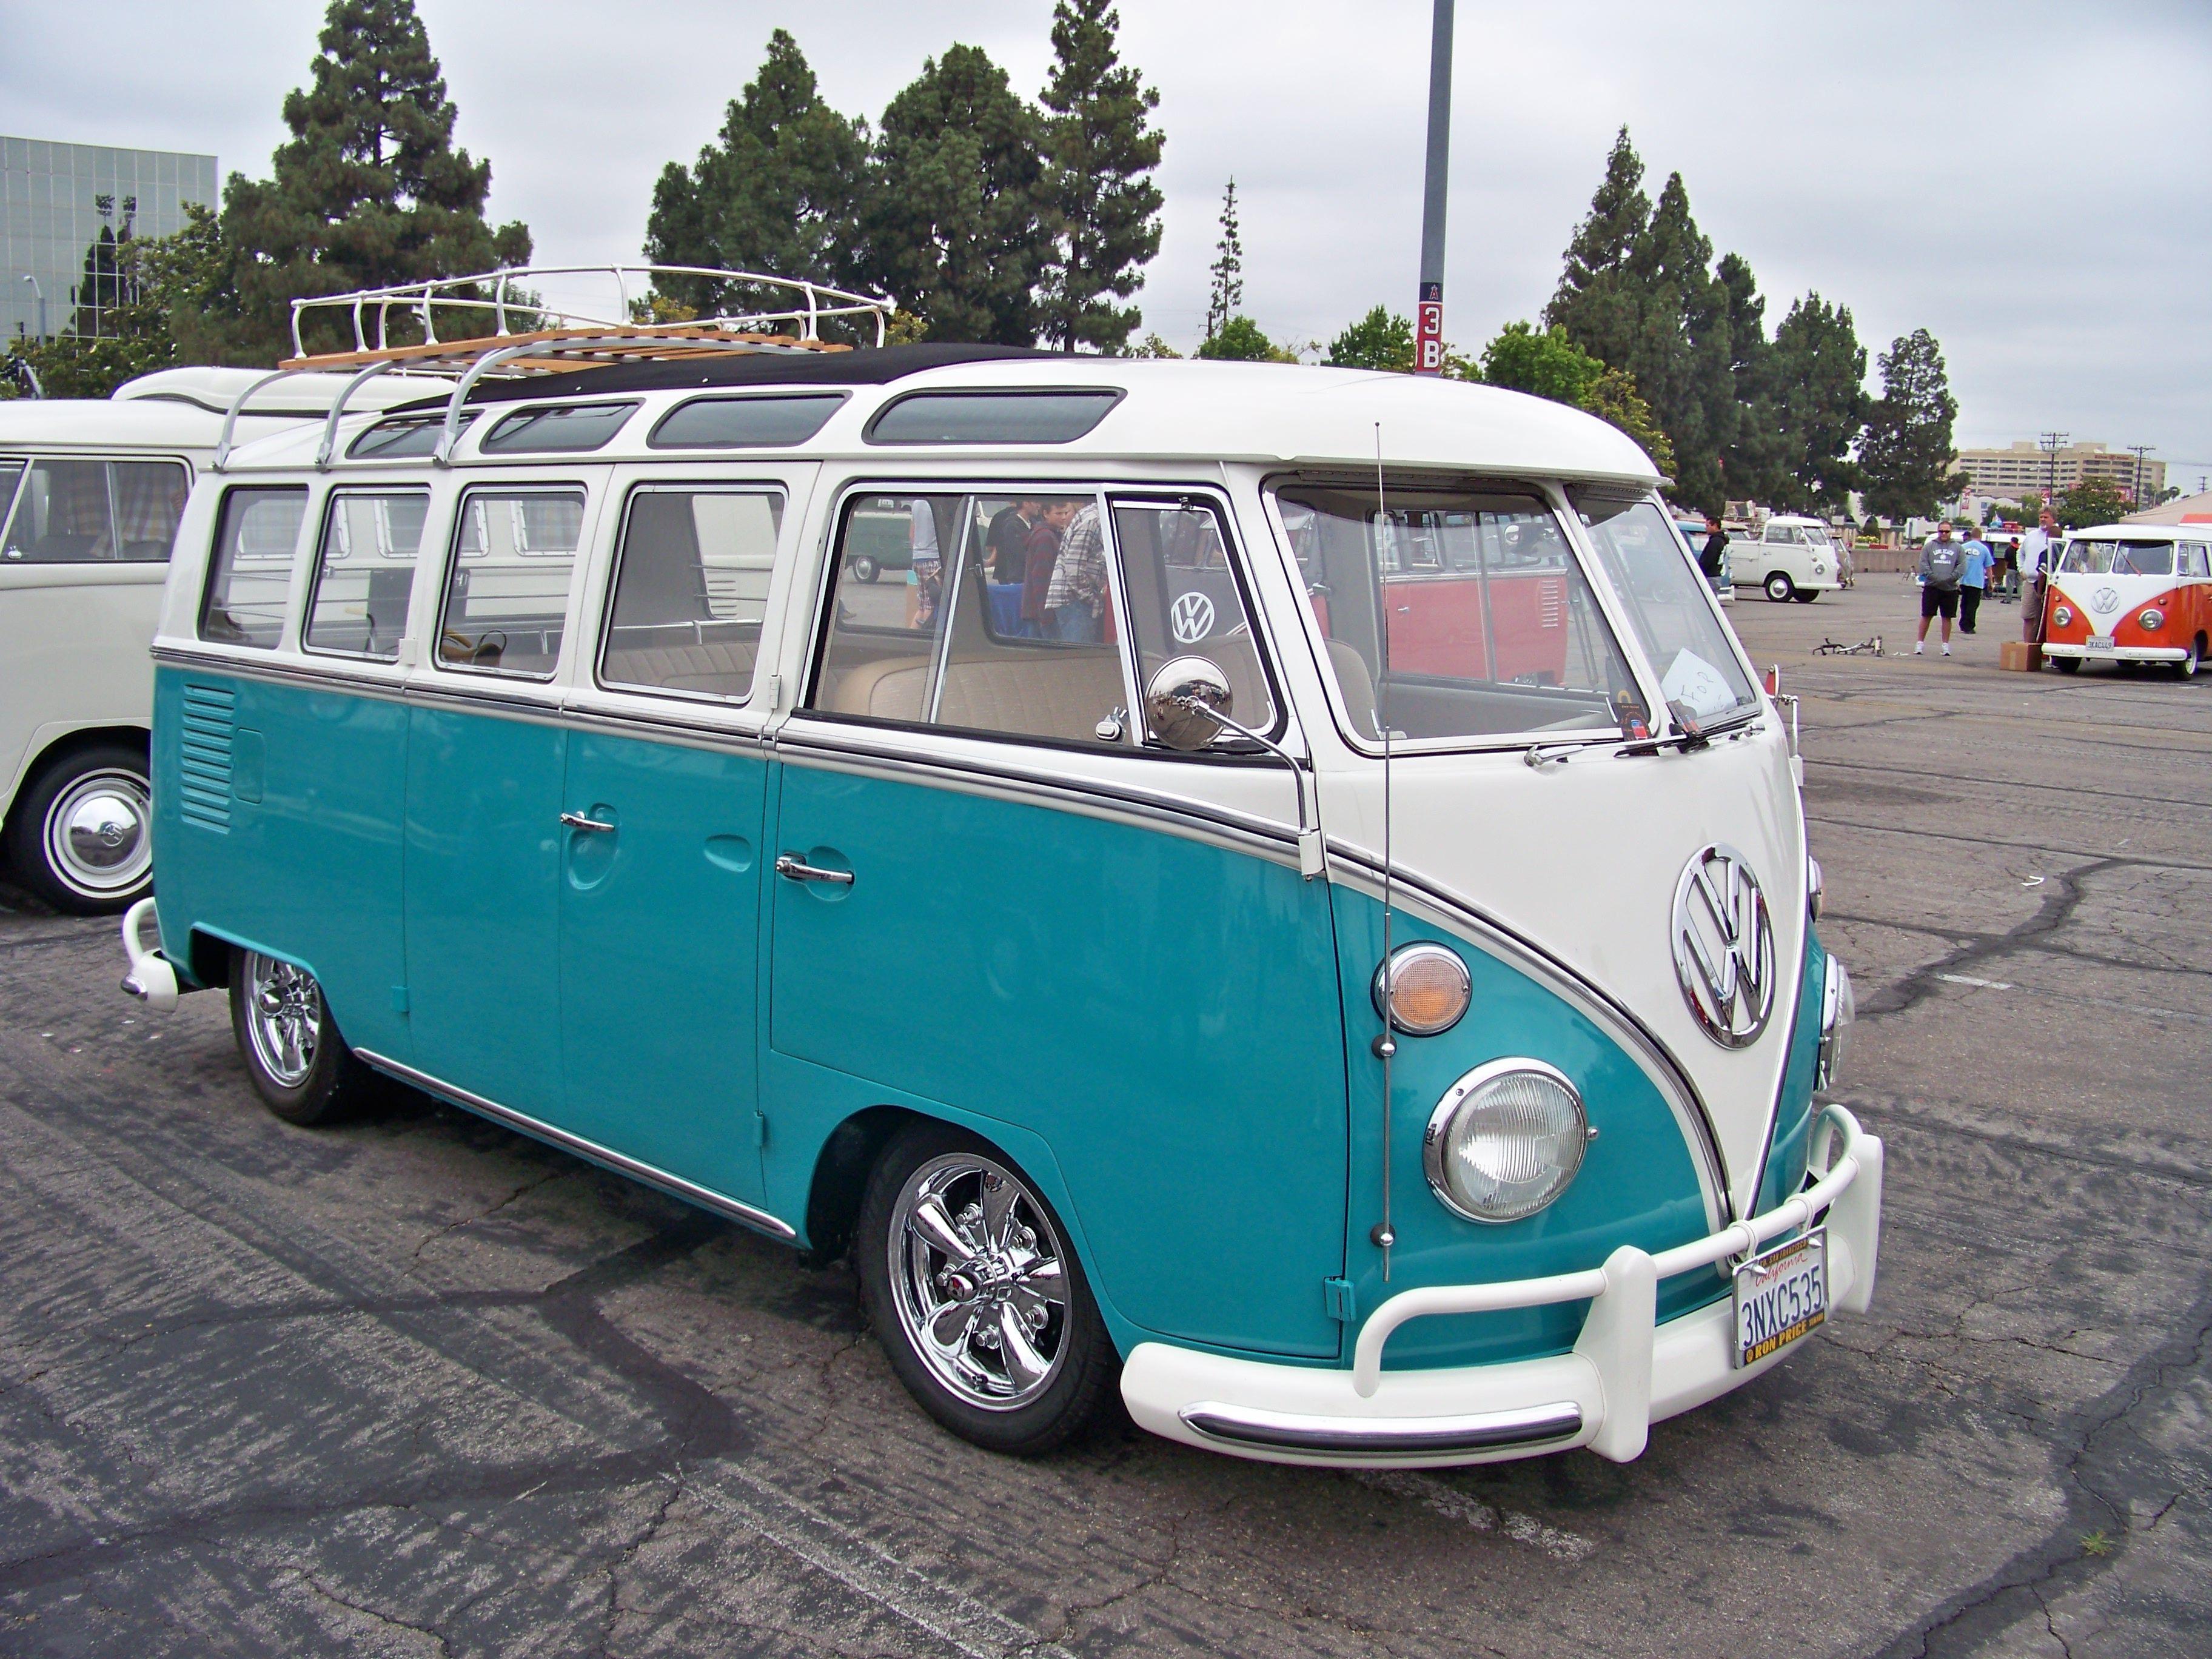 vw bus 21 window...luv it!! Vw bus, Volkswagen bus, Vw